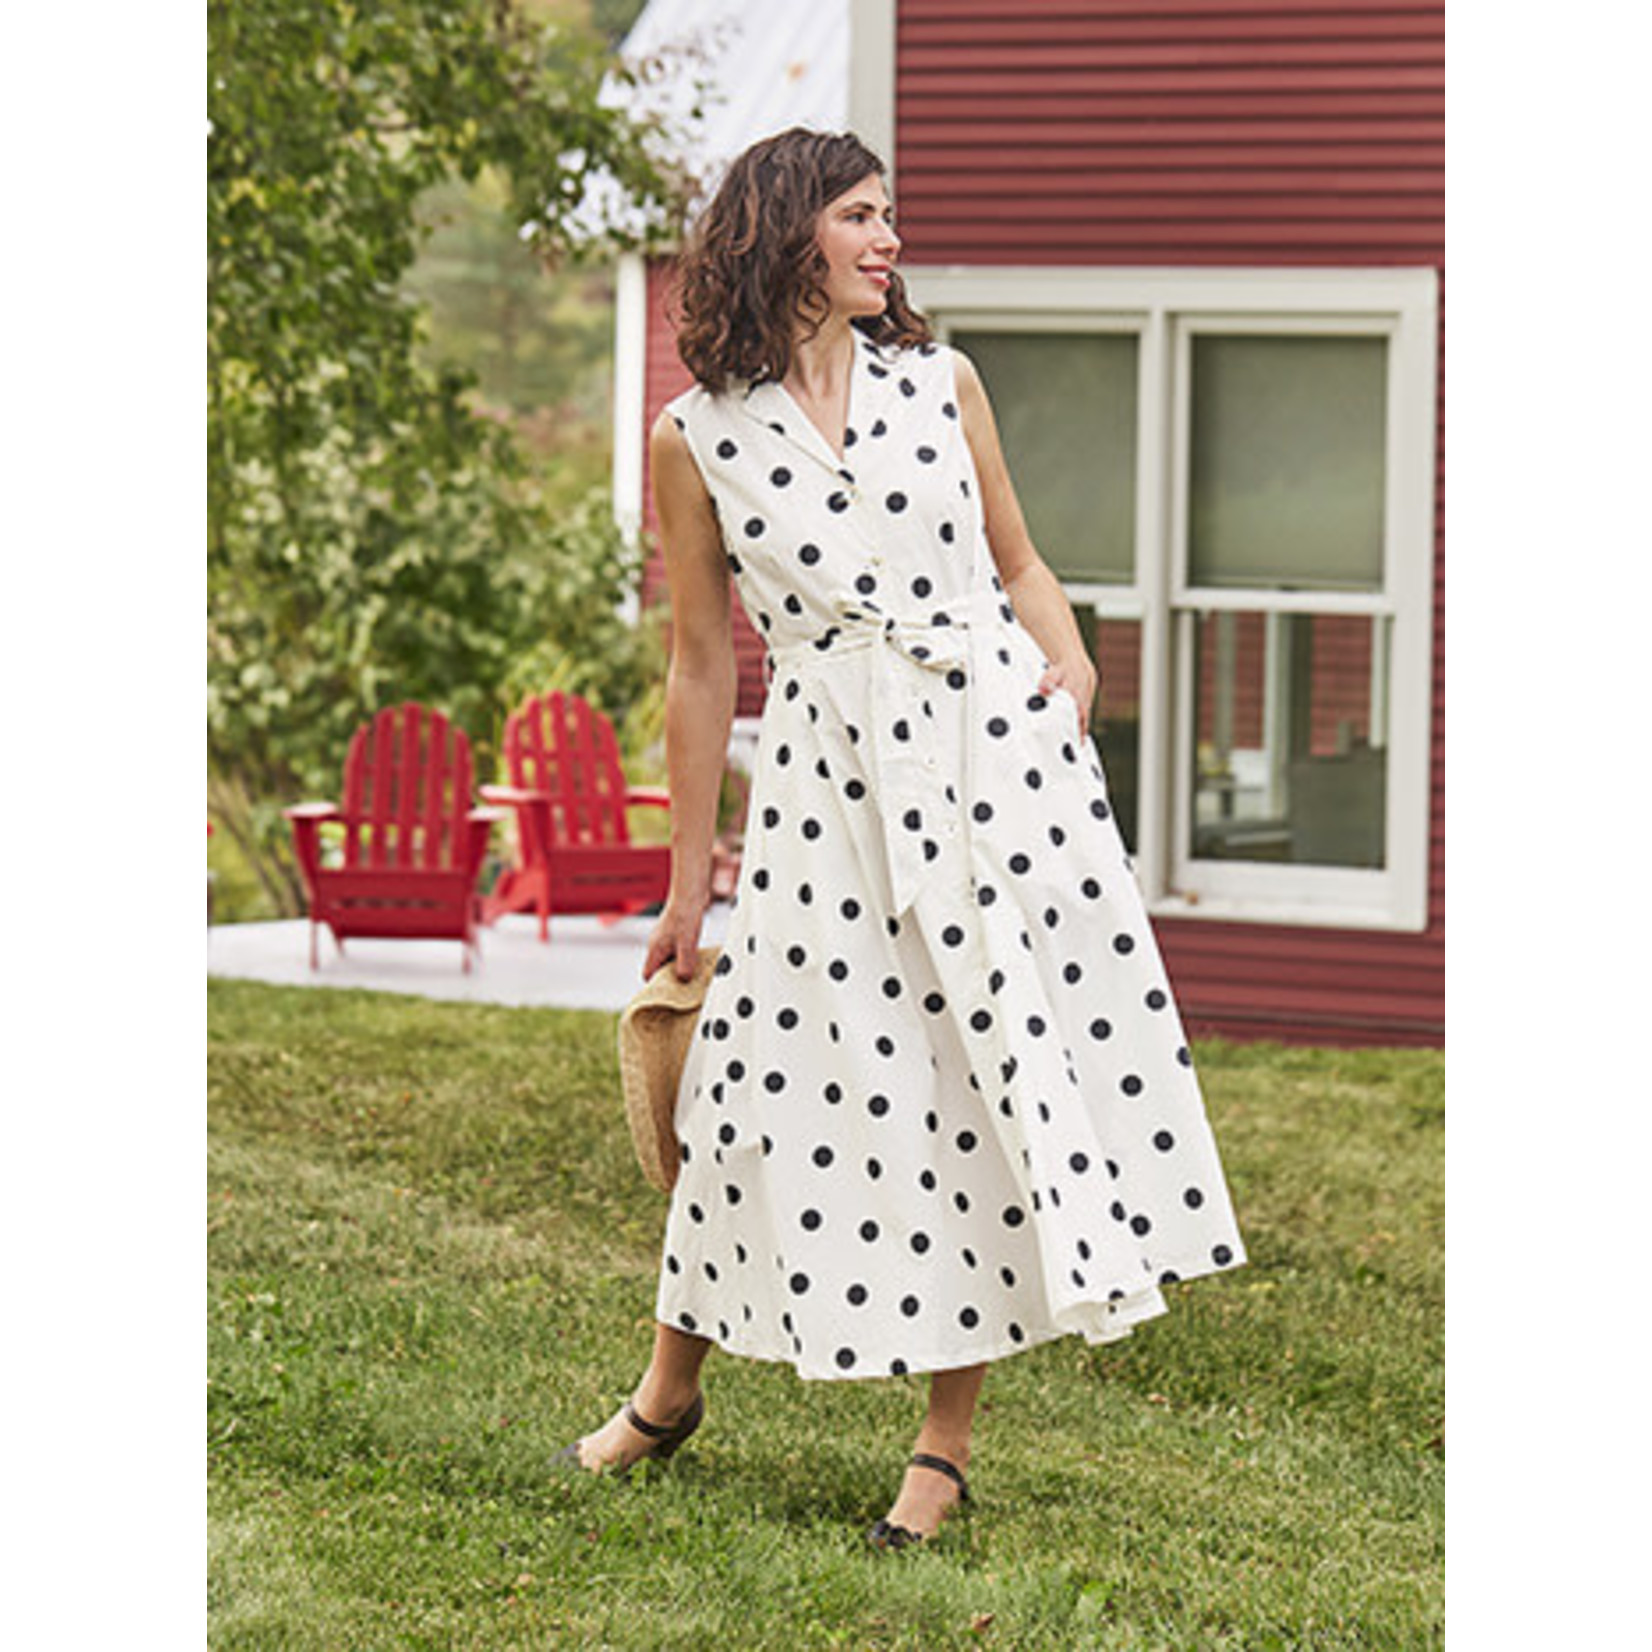 April Cornell April Cornell Sadie Dot Dress